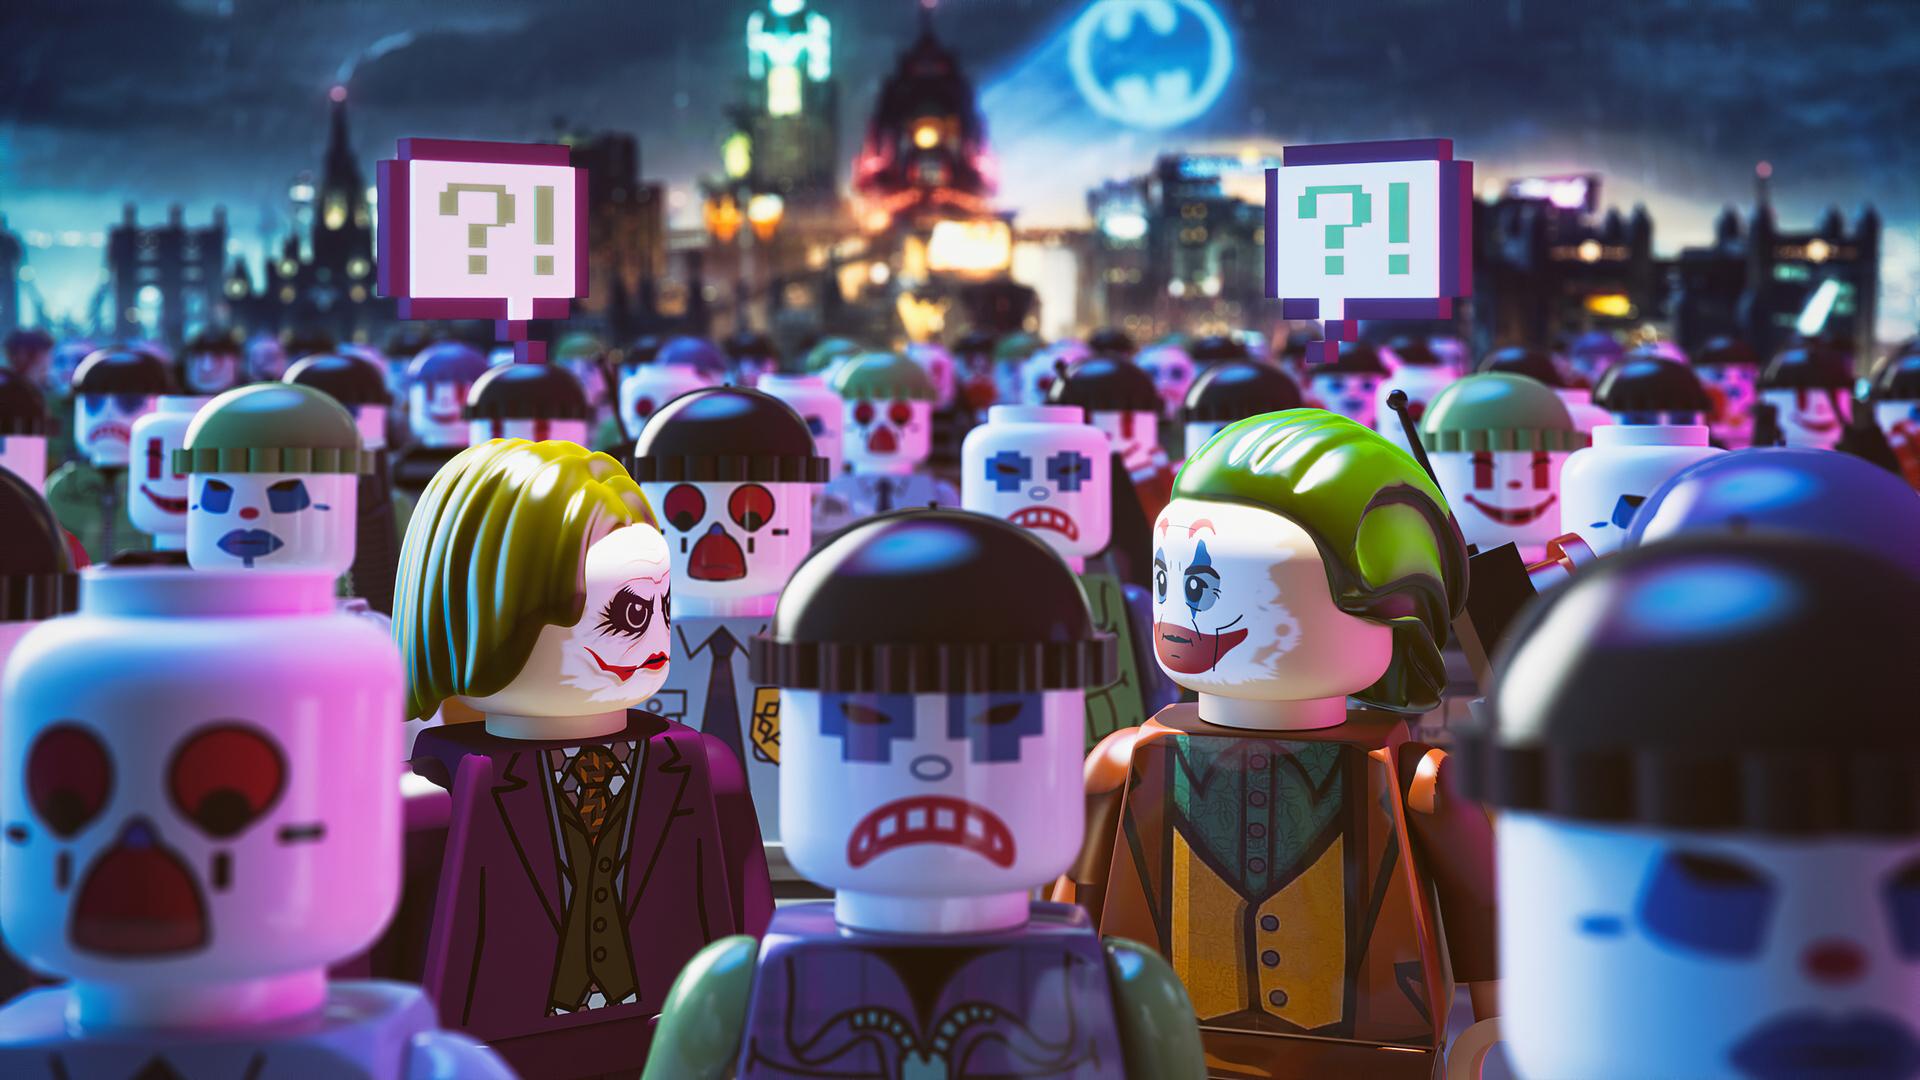 joker-lego-4k-wk.jpg